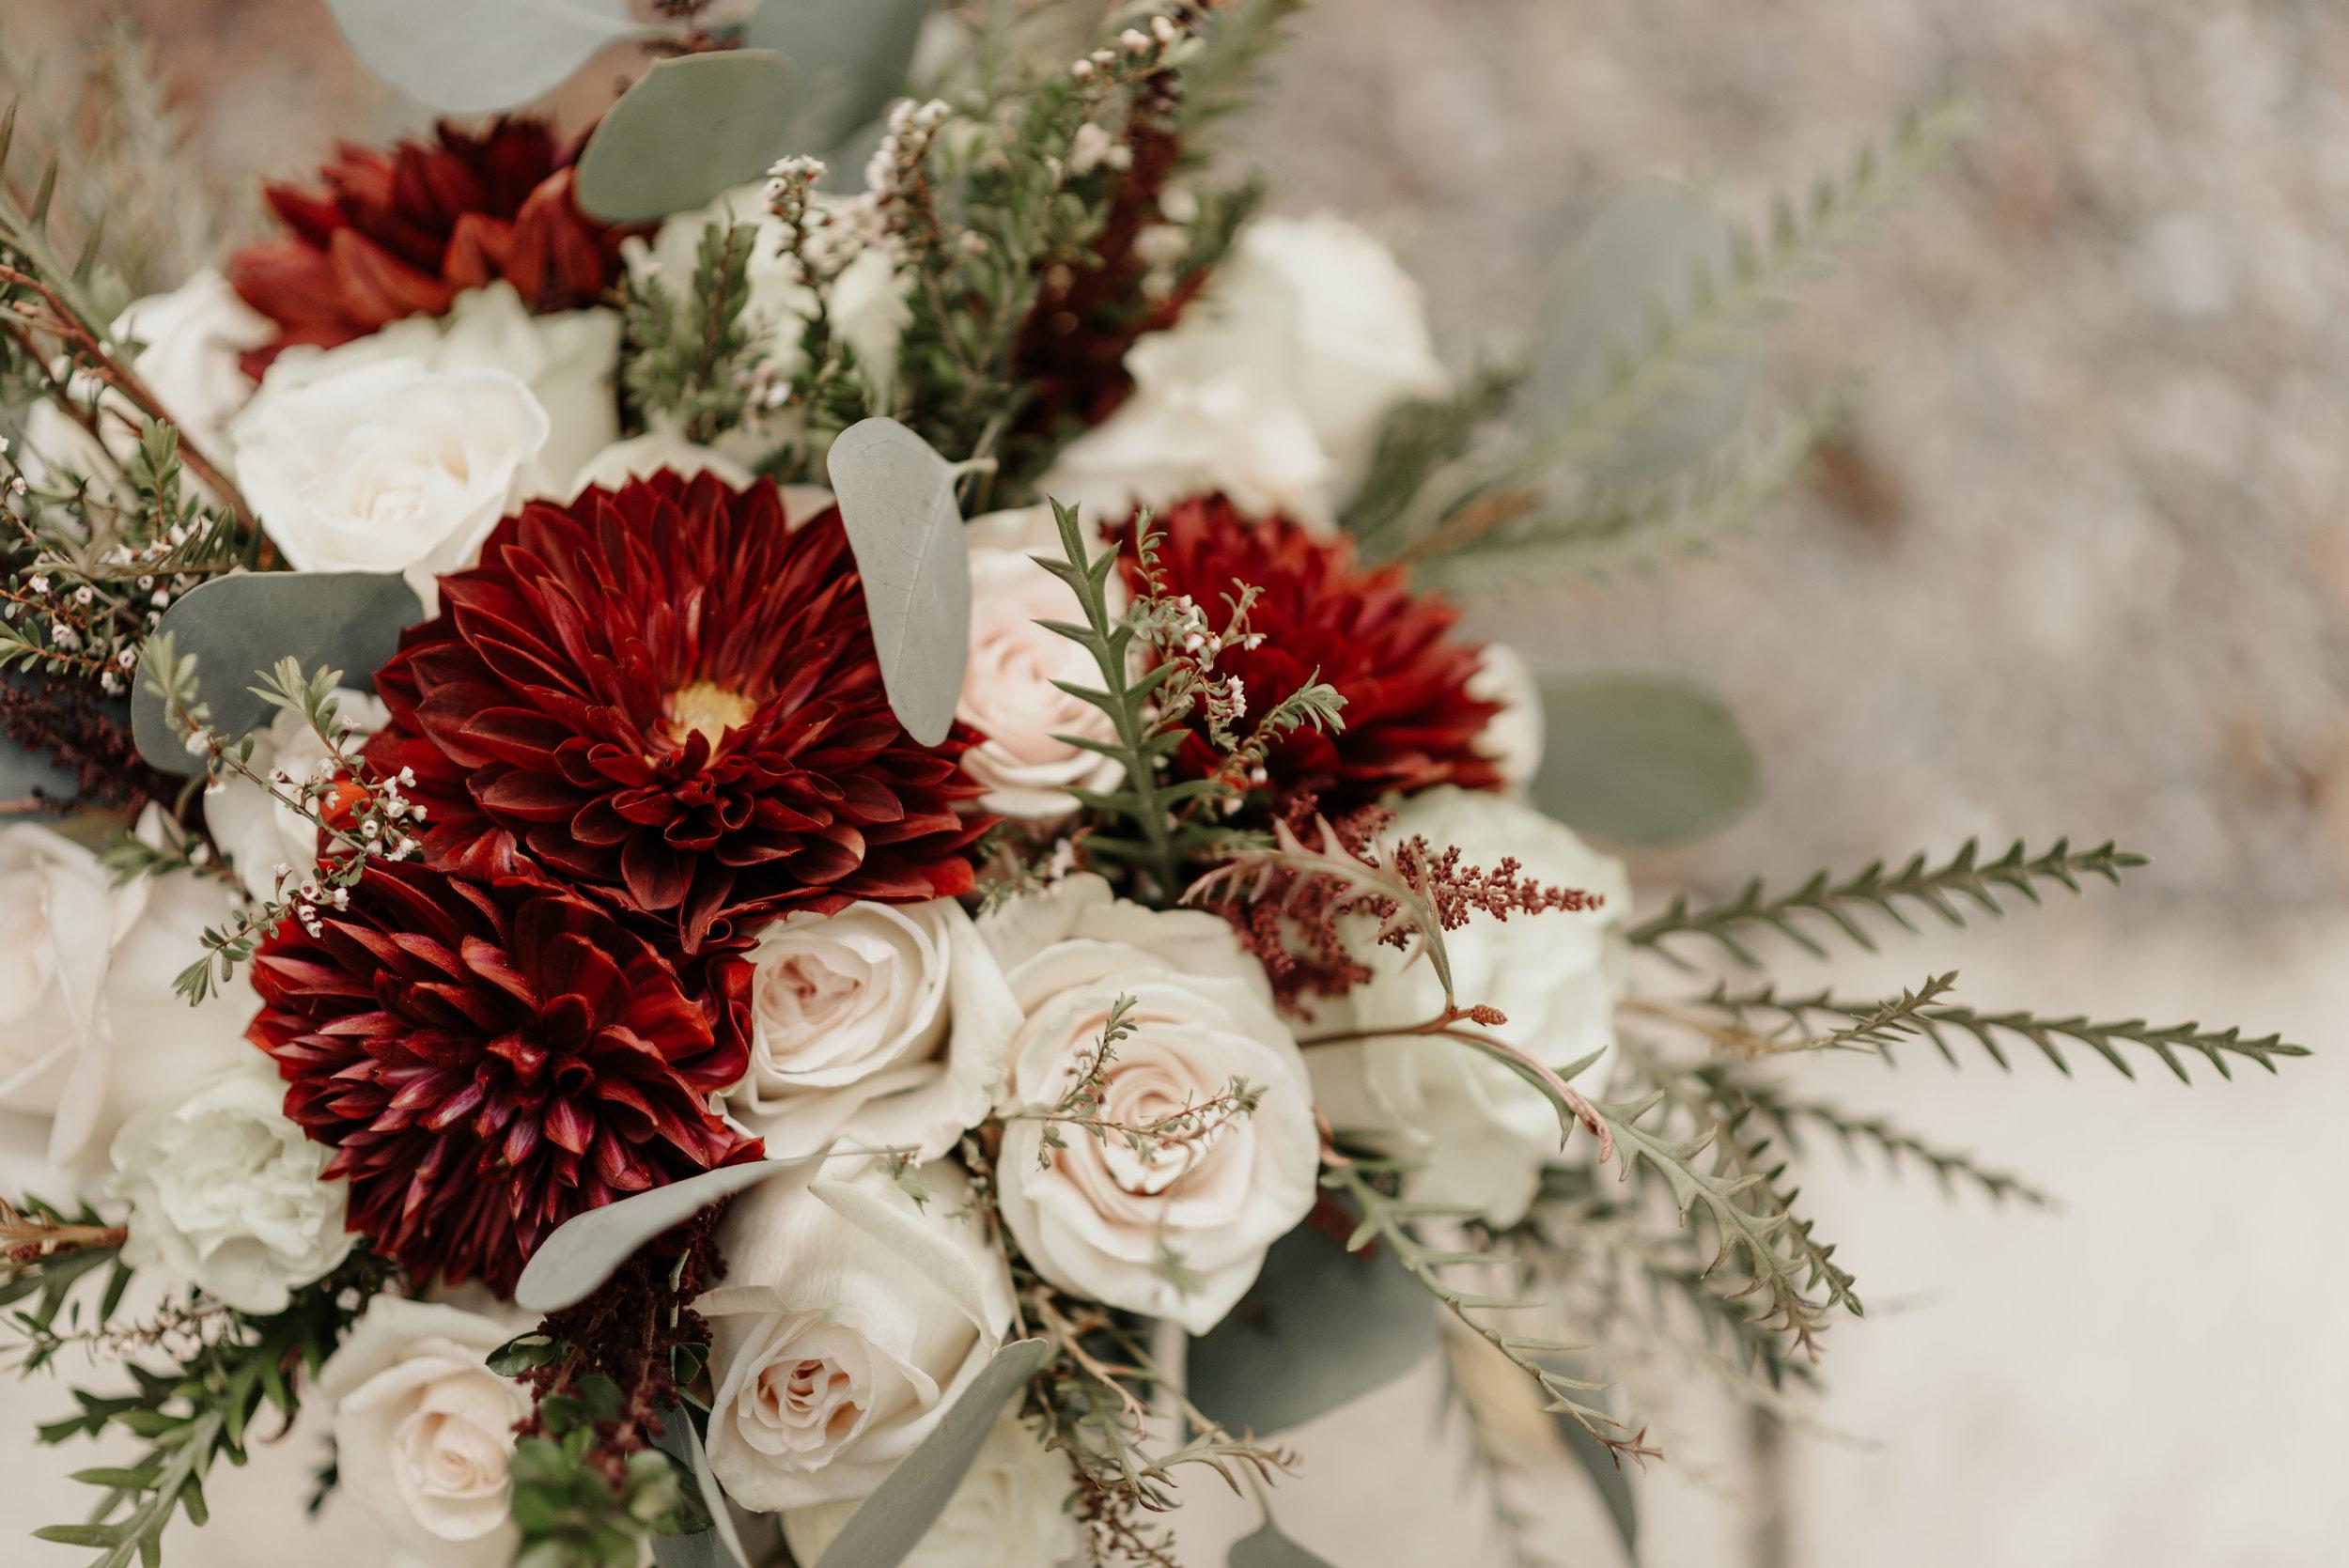 Kirstie-AJ-Wedding-9605.jpg